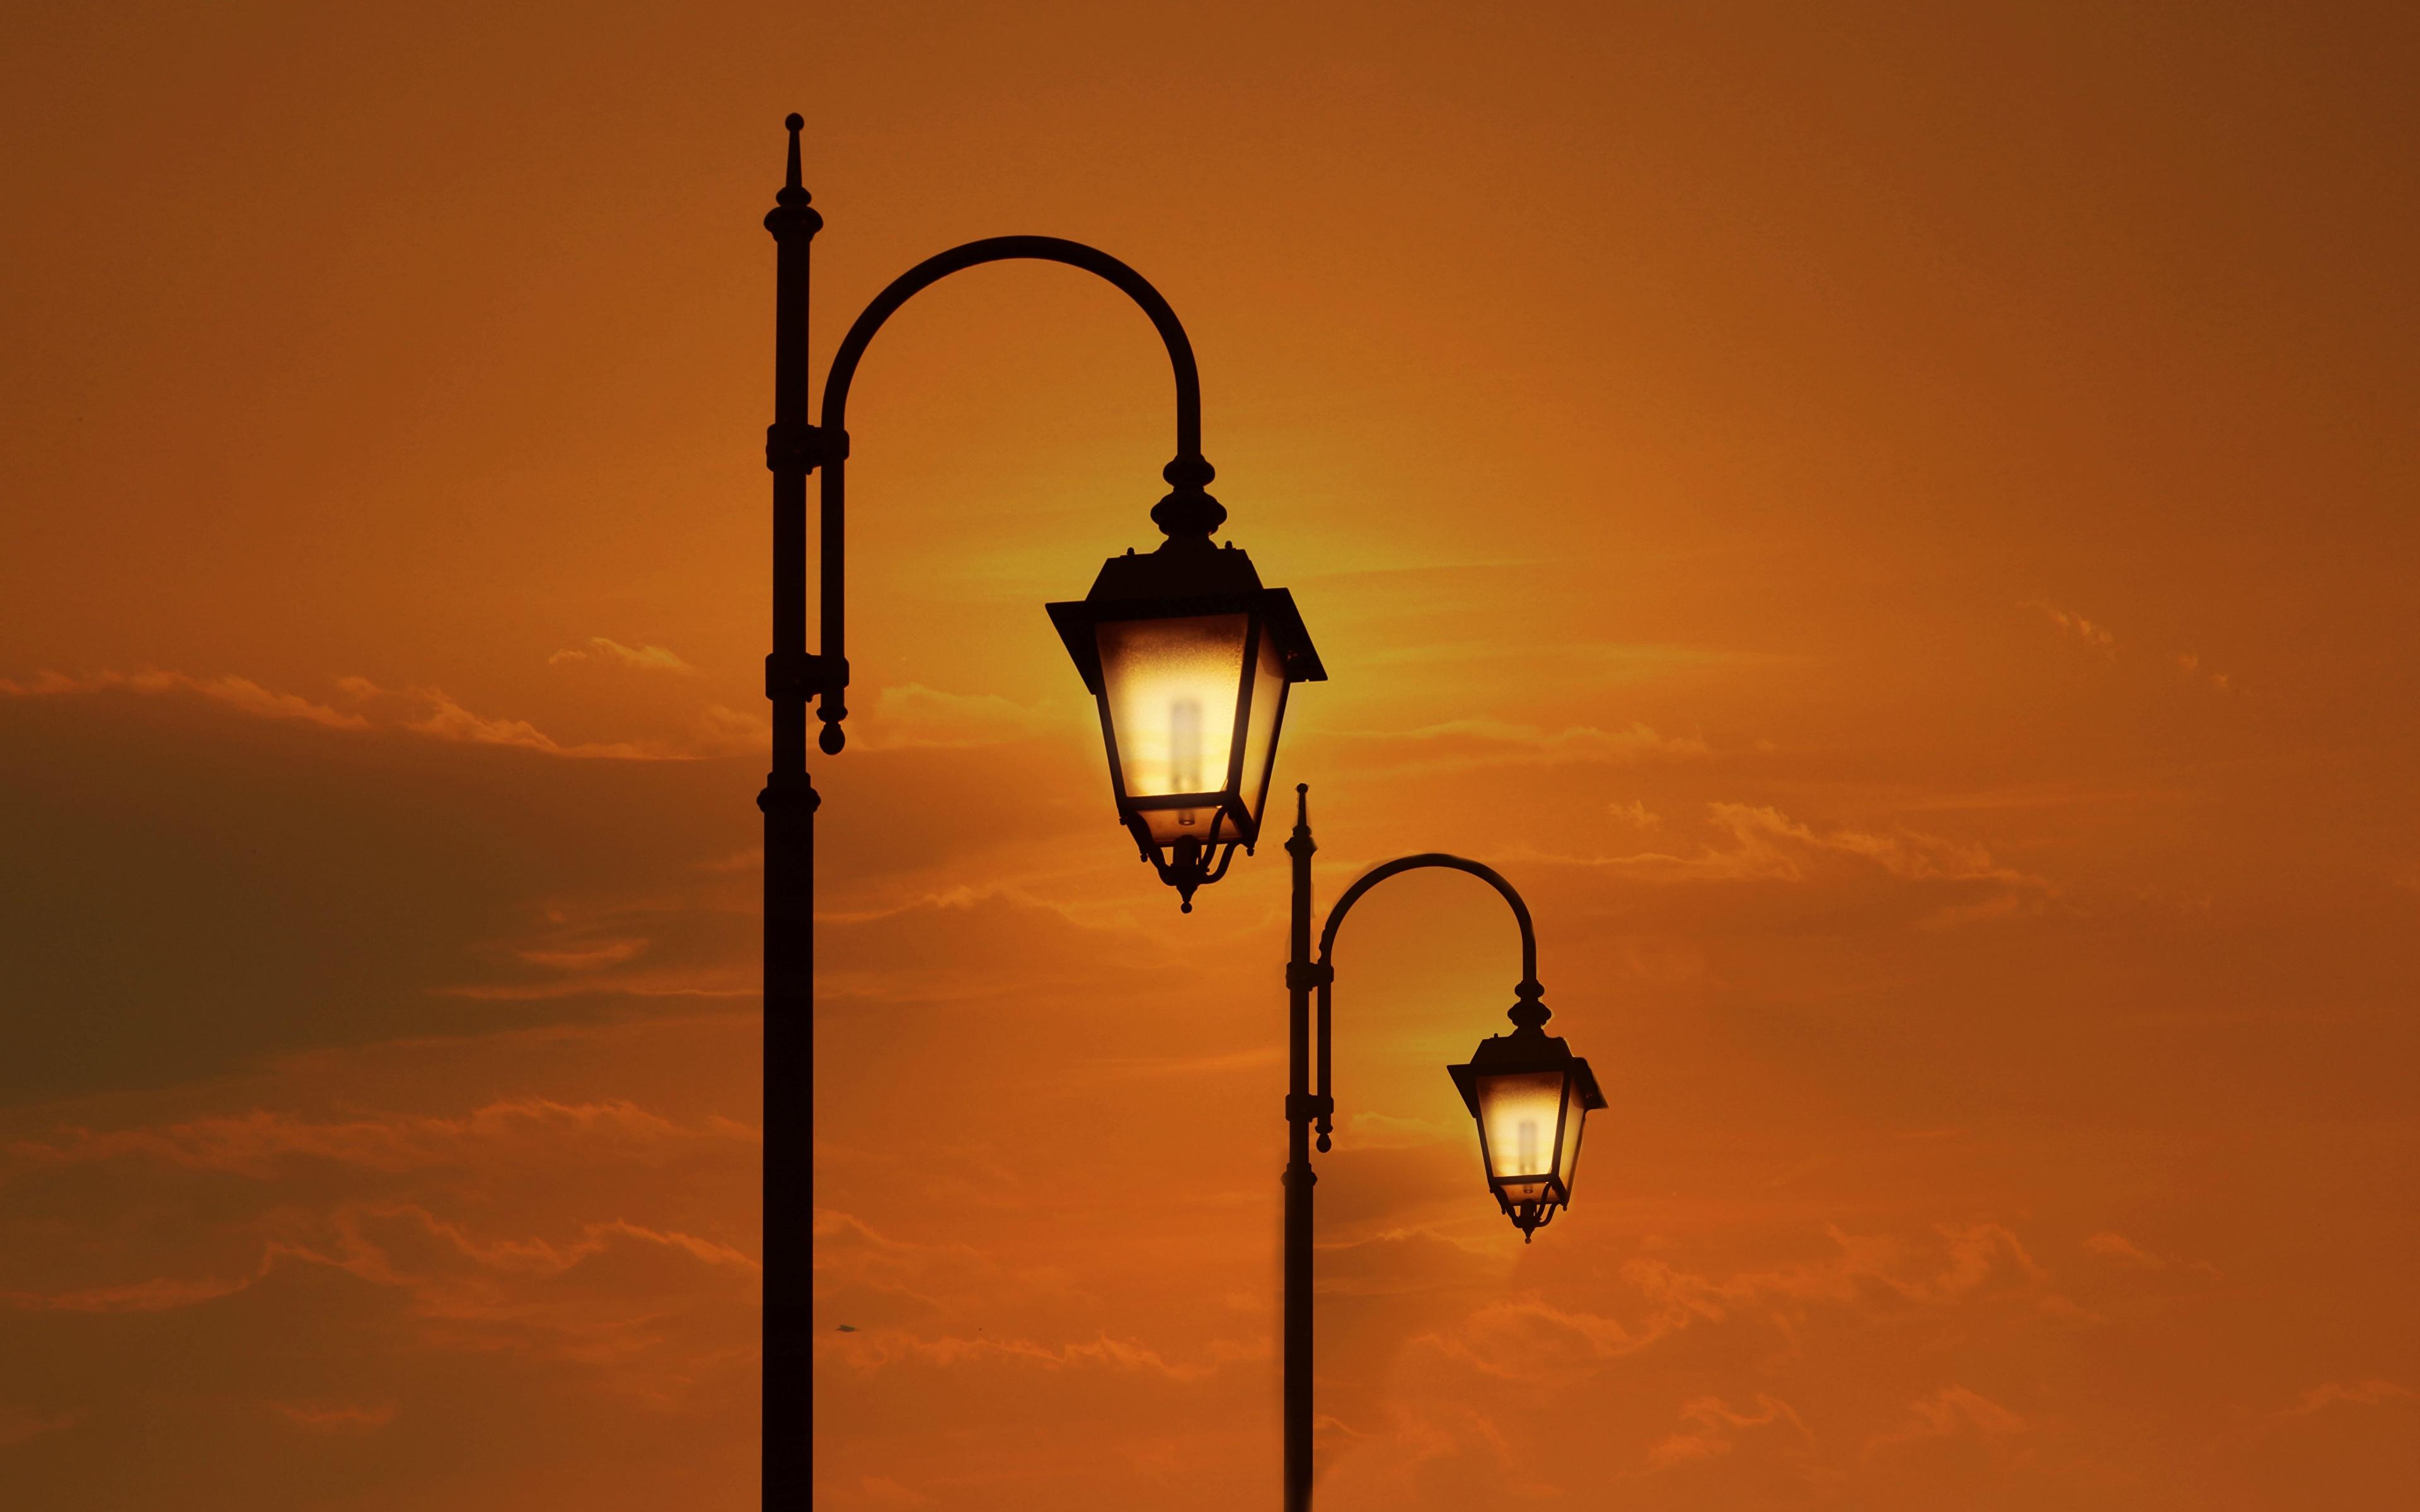 Photos Two Sunrises and sunsets Street lights 3840x2400 2 sunrise and sunset